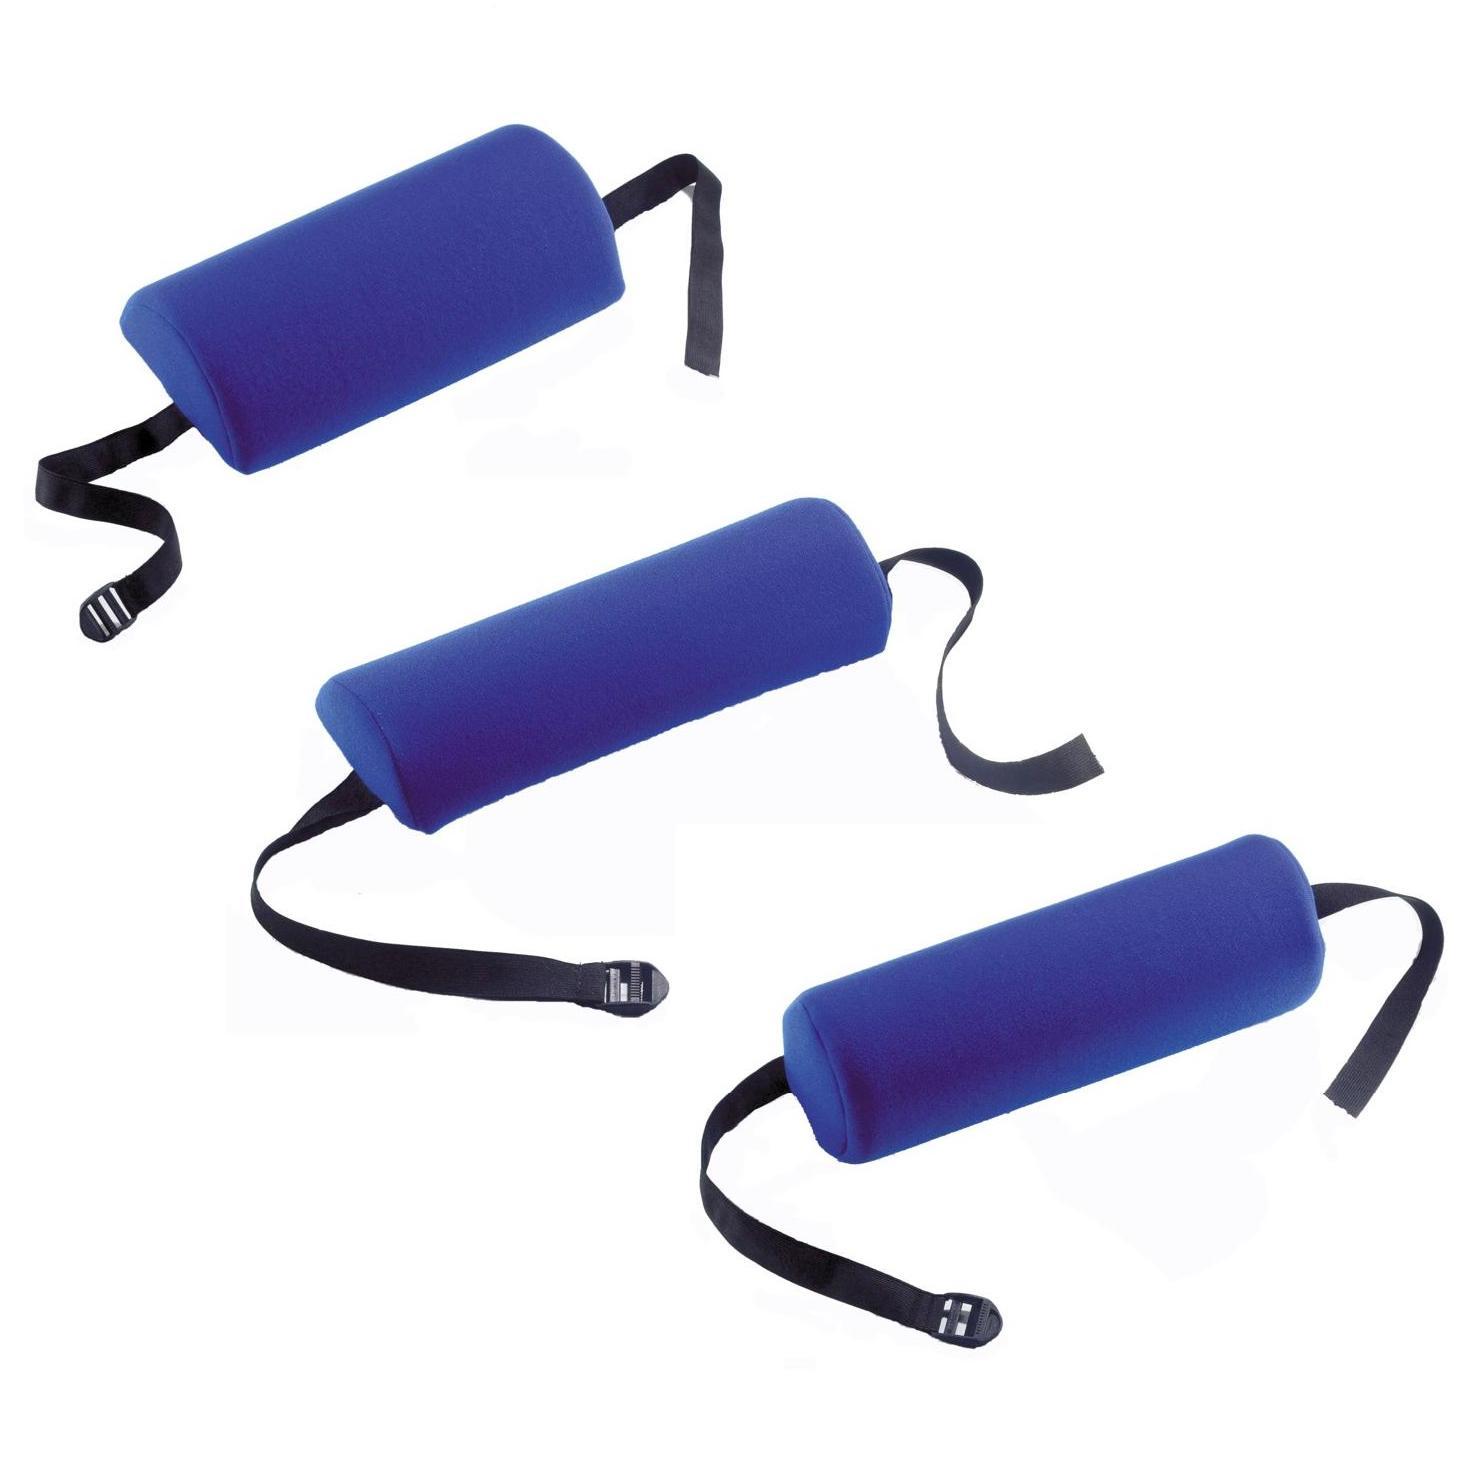 Cojines lumbares lumbar rolls productos de farmacia ortop dia diagonal mar - Cojin lumbar para silla de oficina ...